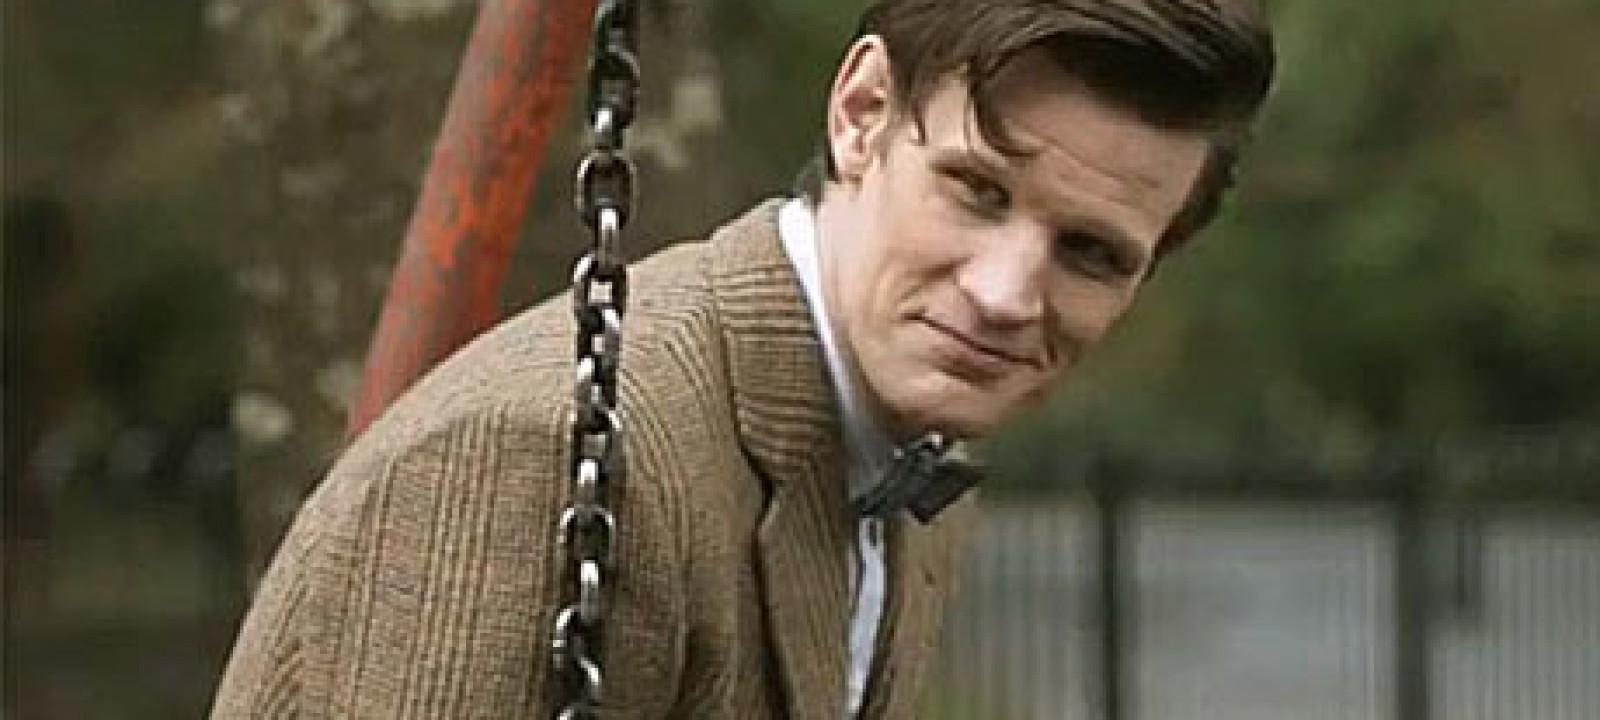 Doctor Who: The Bells of Saint John Prequel